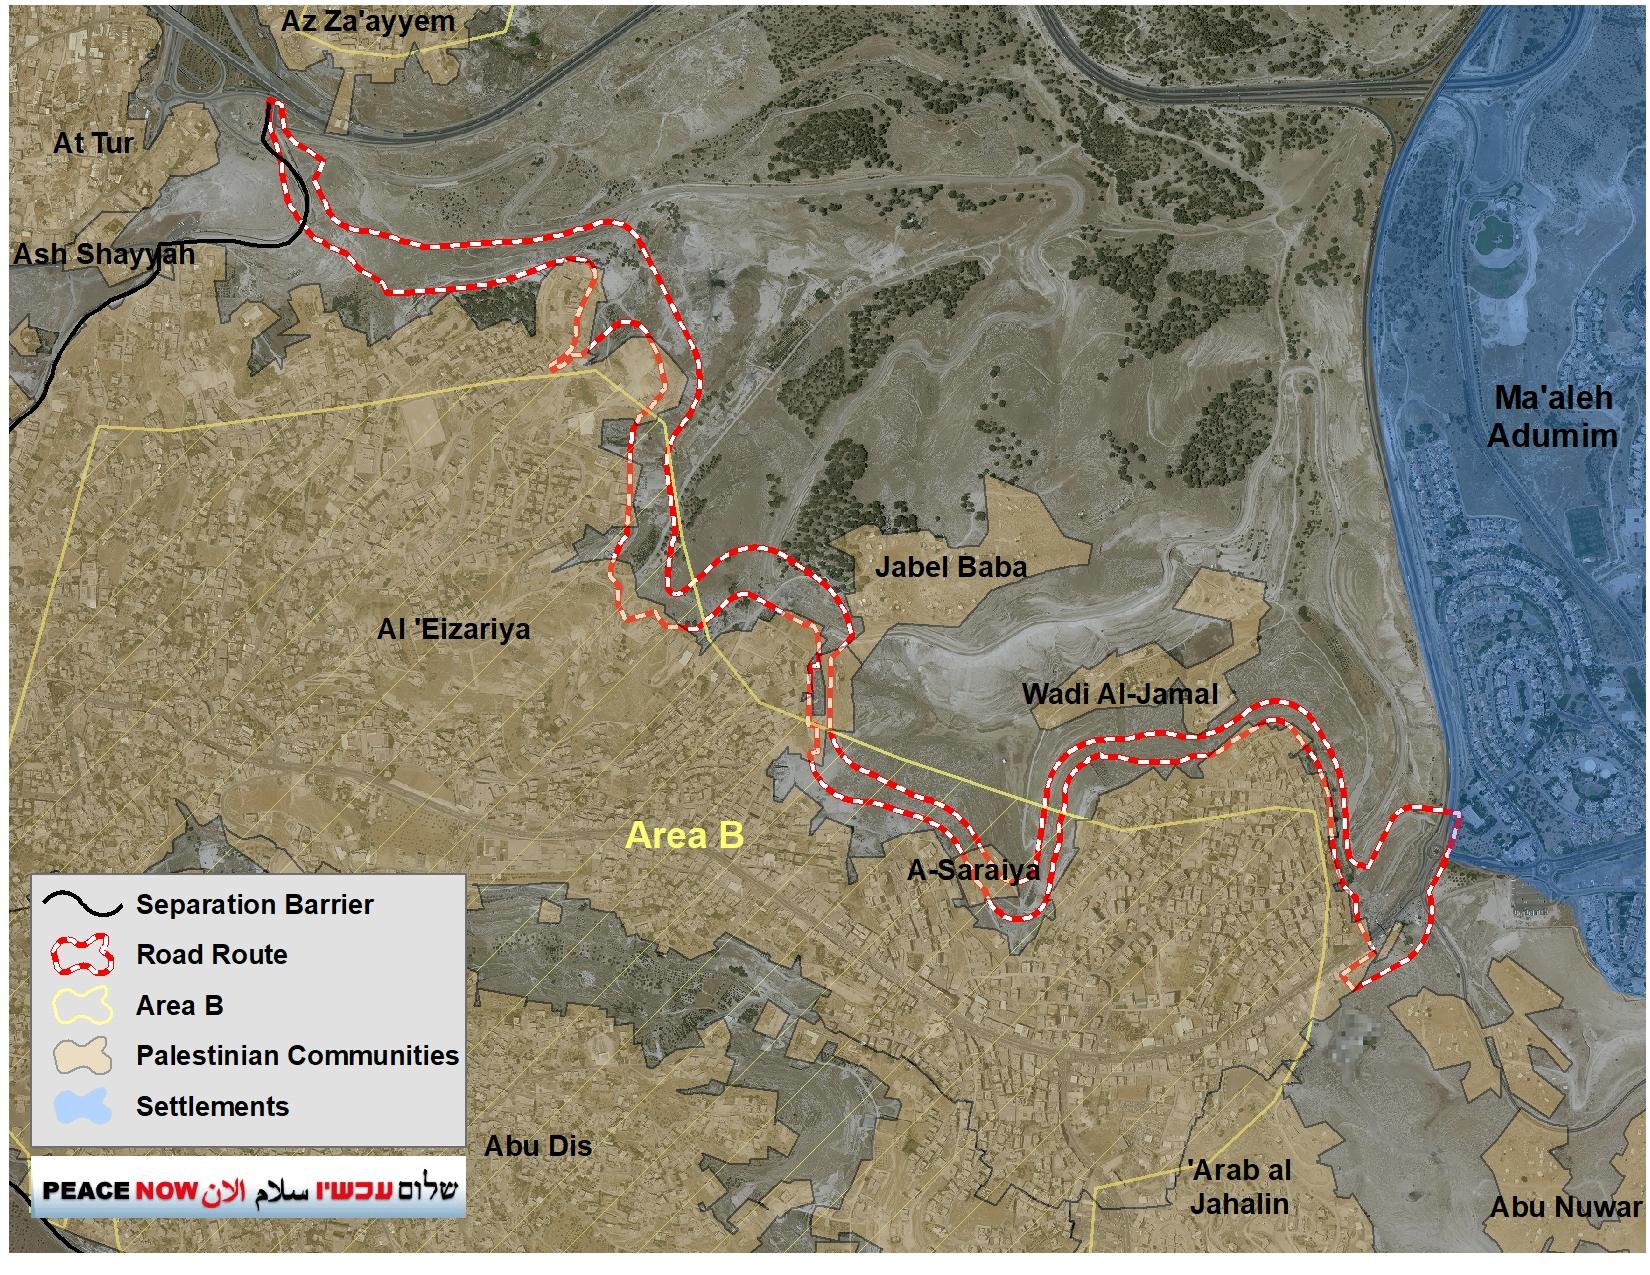 Sovereignty Road Al-azariya a-zaim E1 כביש הריבונות אלעזריה א-זעים